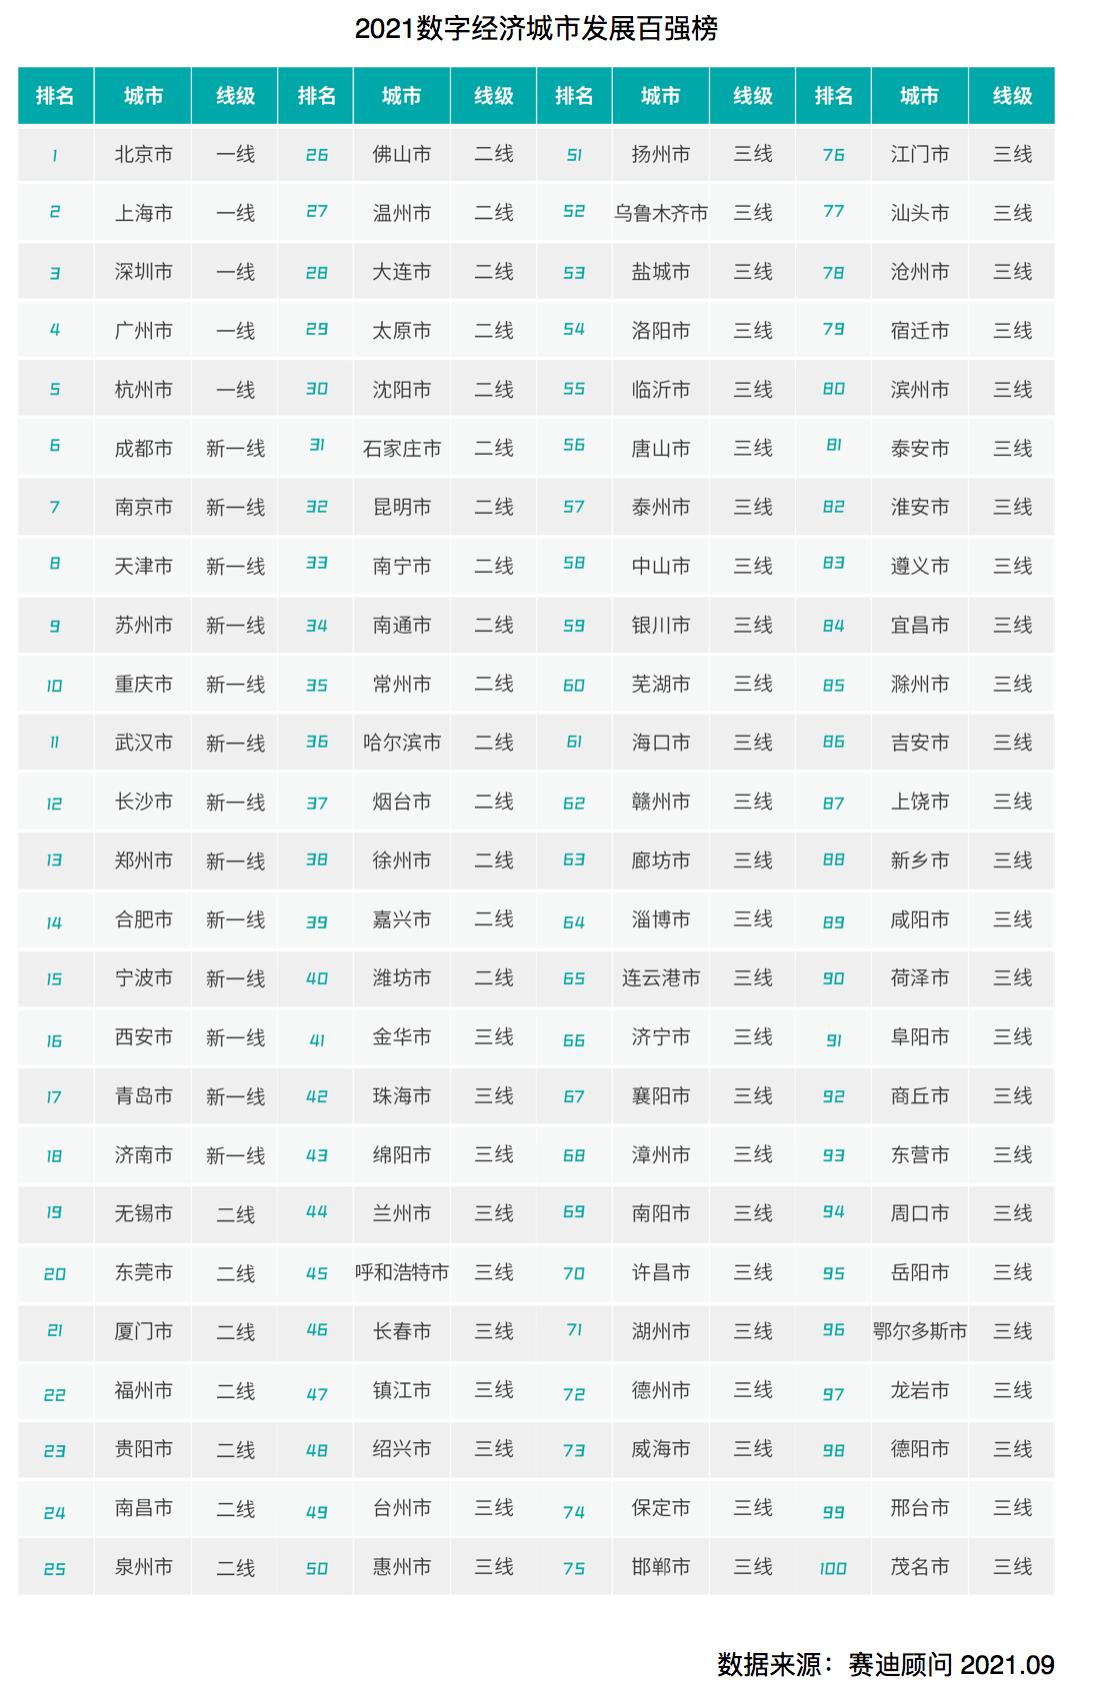 http://www.jdpiano.cn/jingji/215614.html